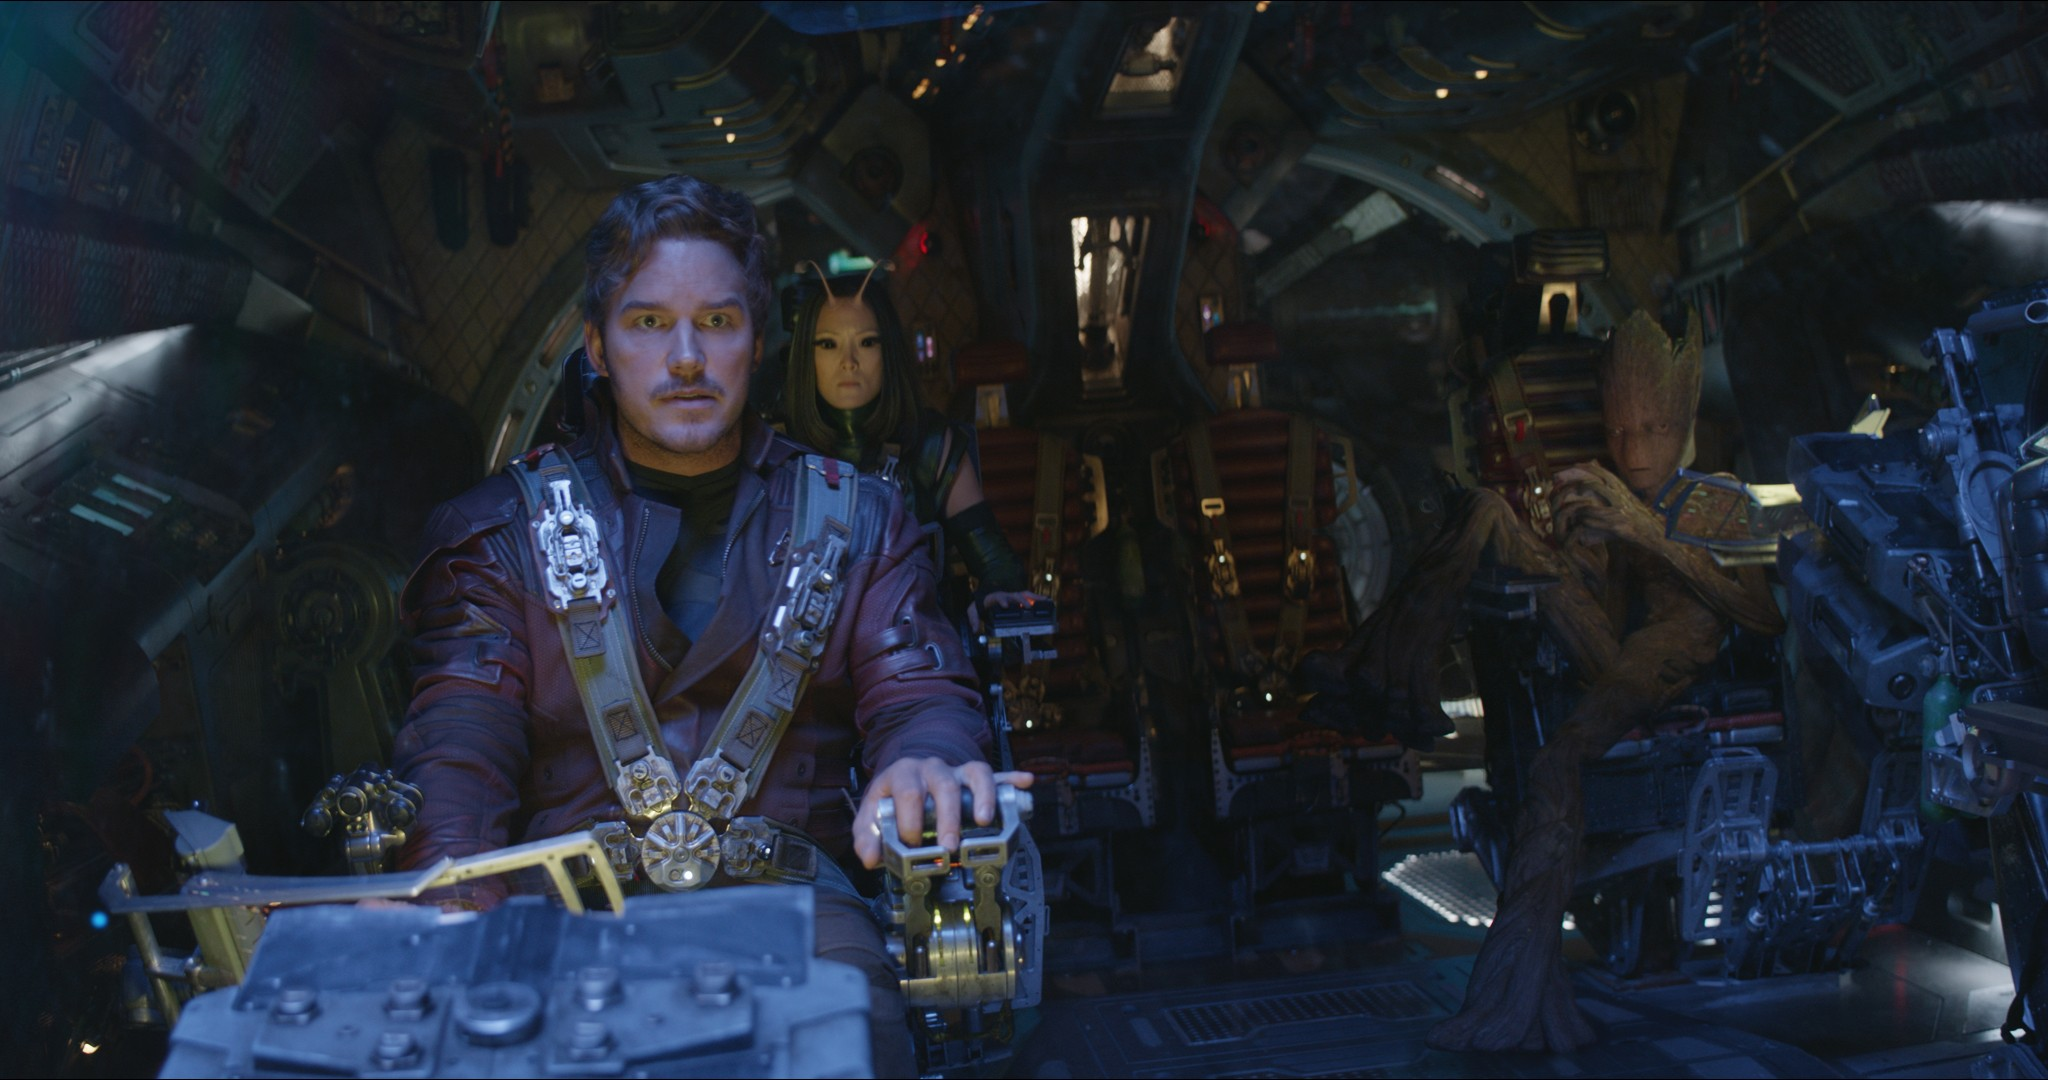 L to R: Star-Lord/Peter Quill (Chris Pratt), Mantis (Pom Klementieff), Groot (voiced by Vin Diesel)  DIsney, Marvel, sky pics, TL